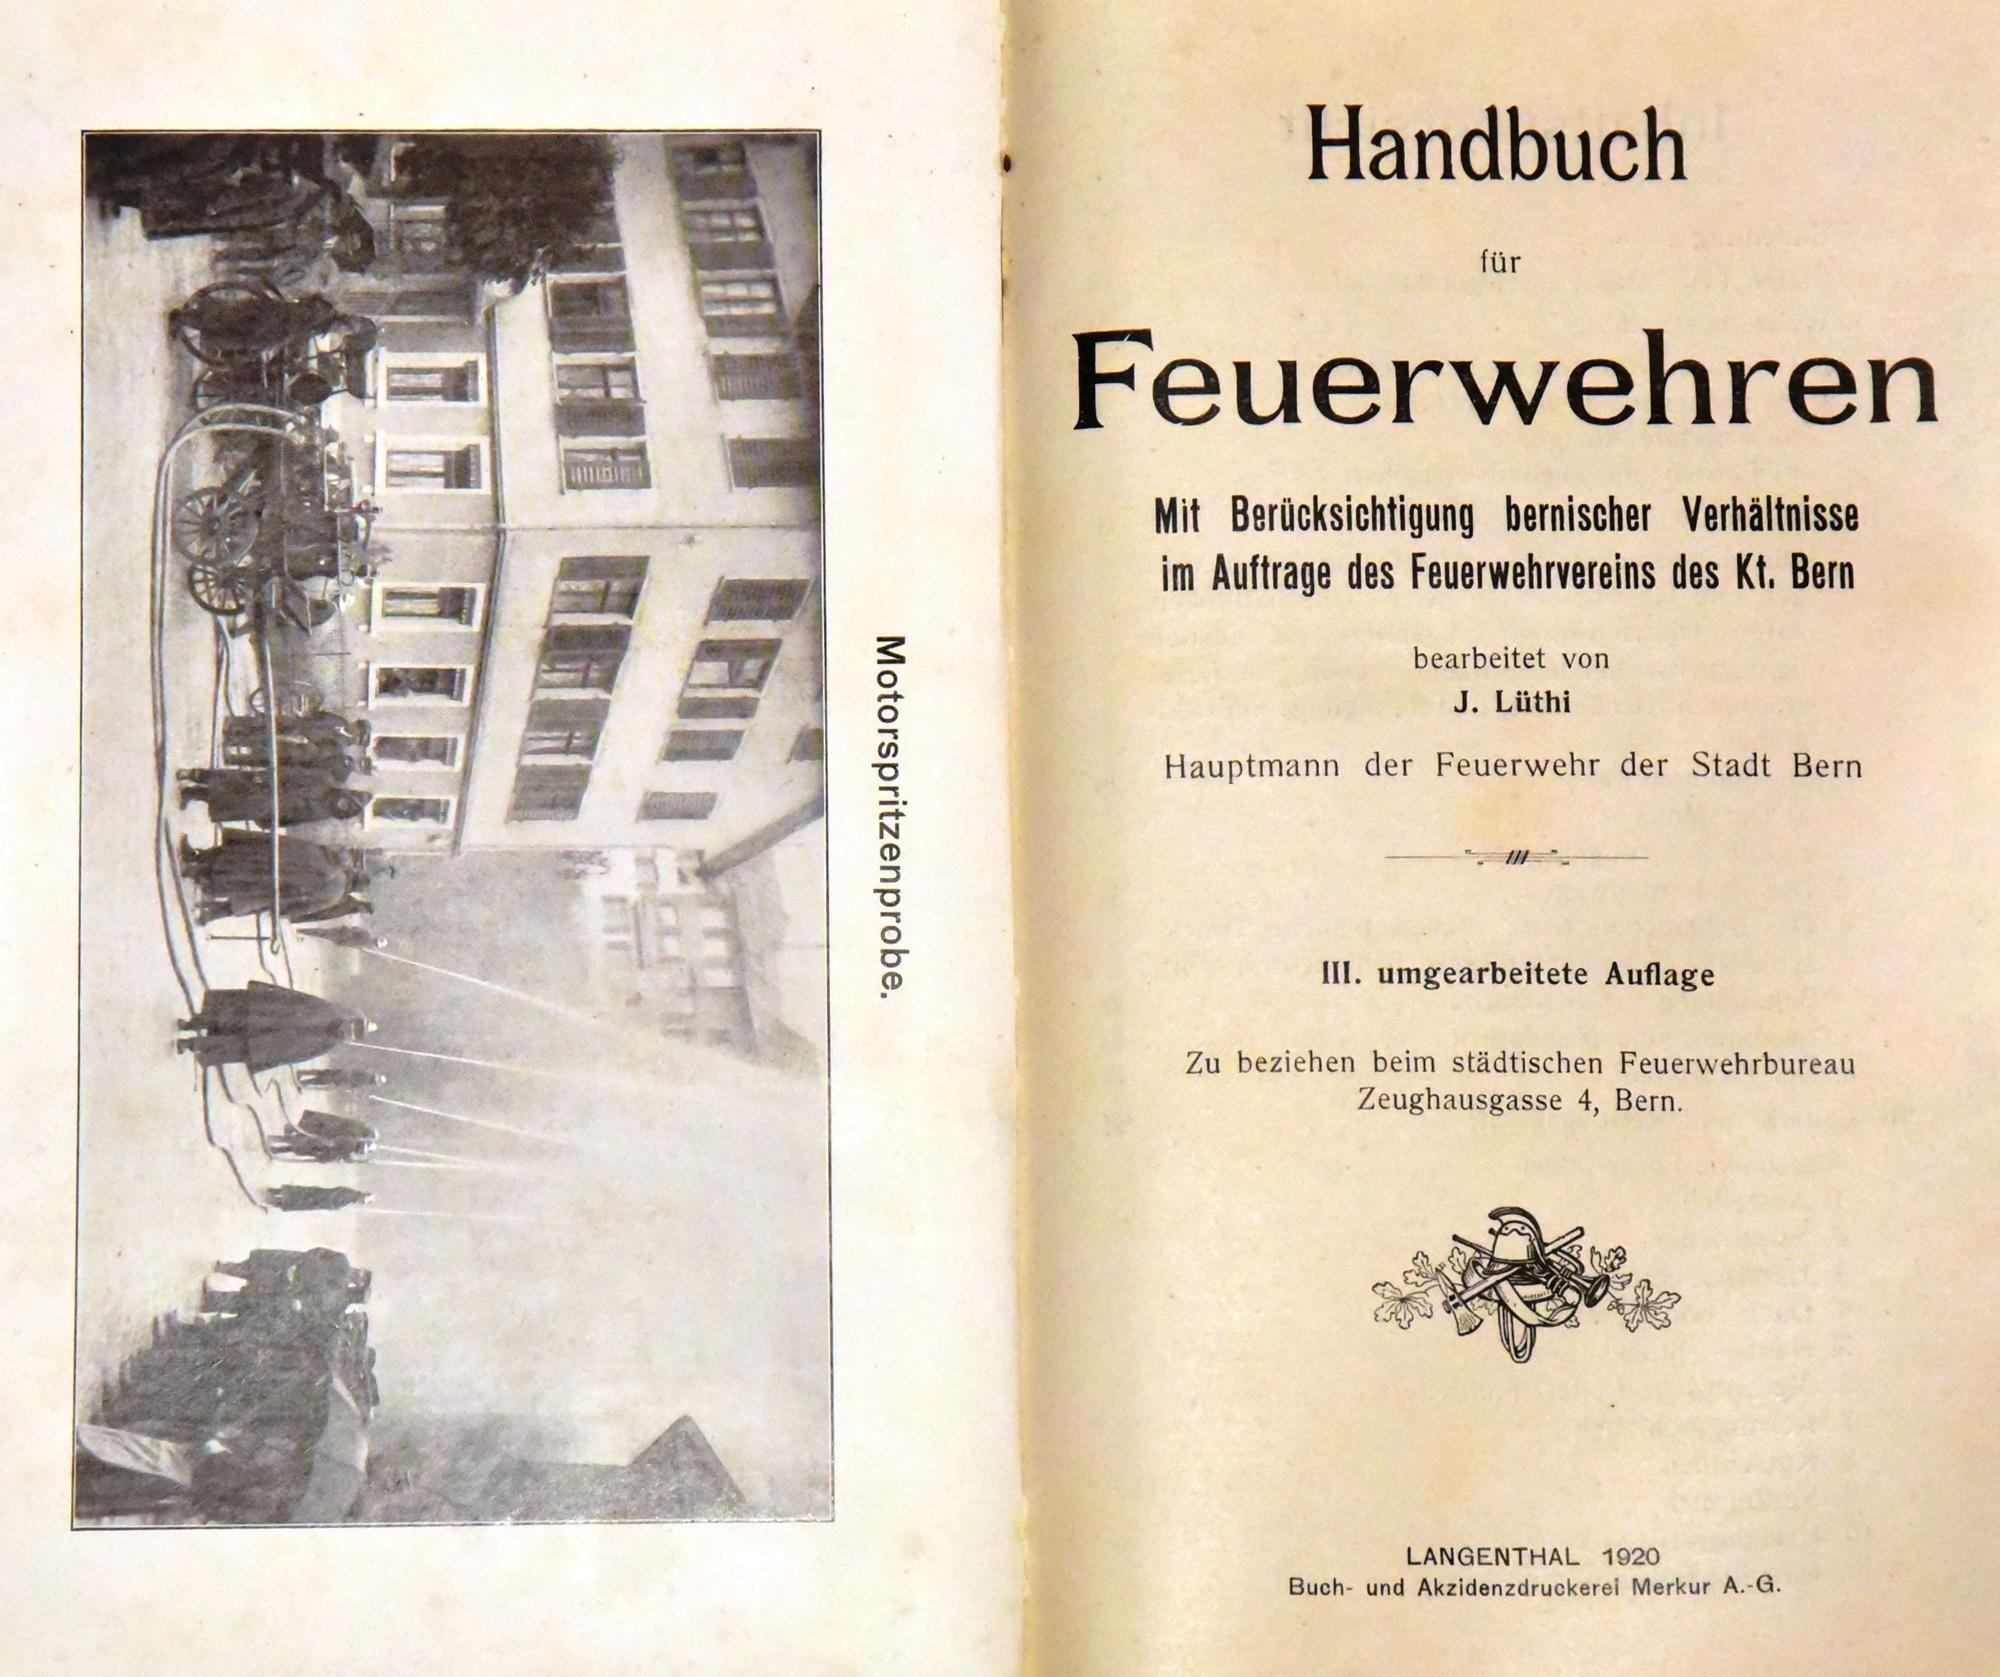 1920 Handbuch